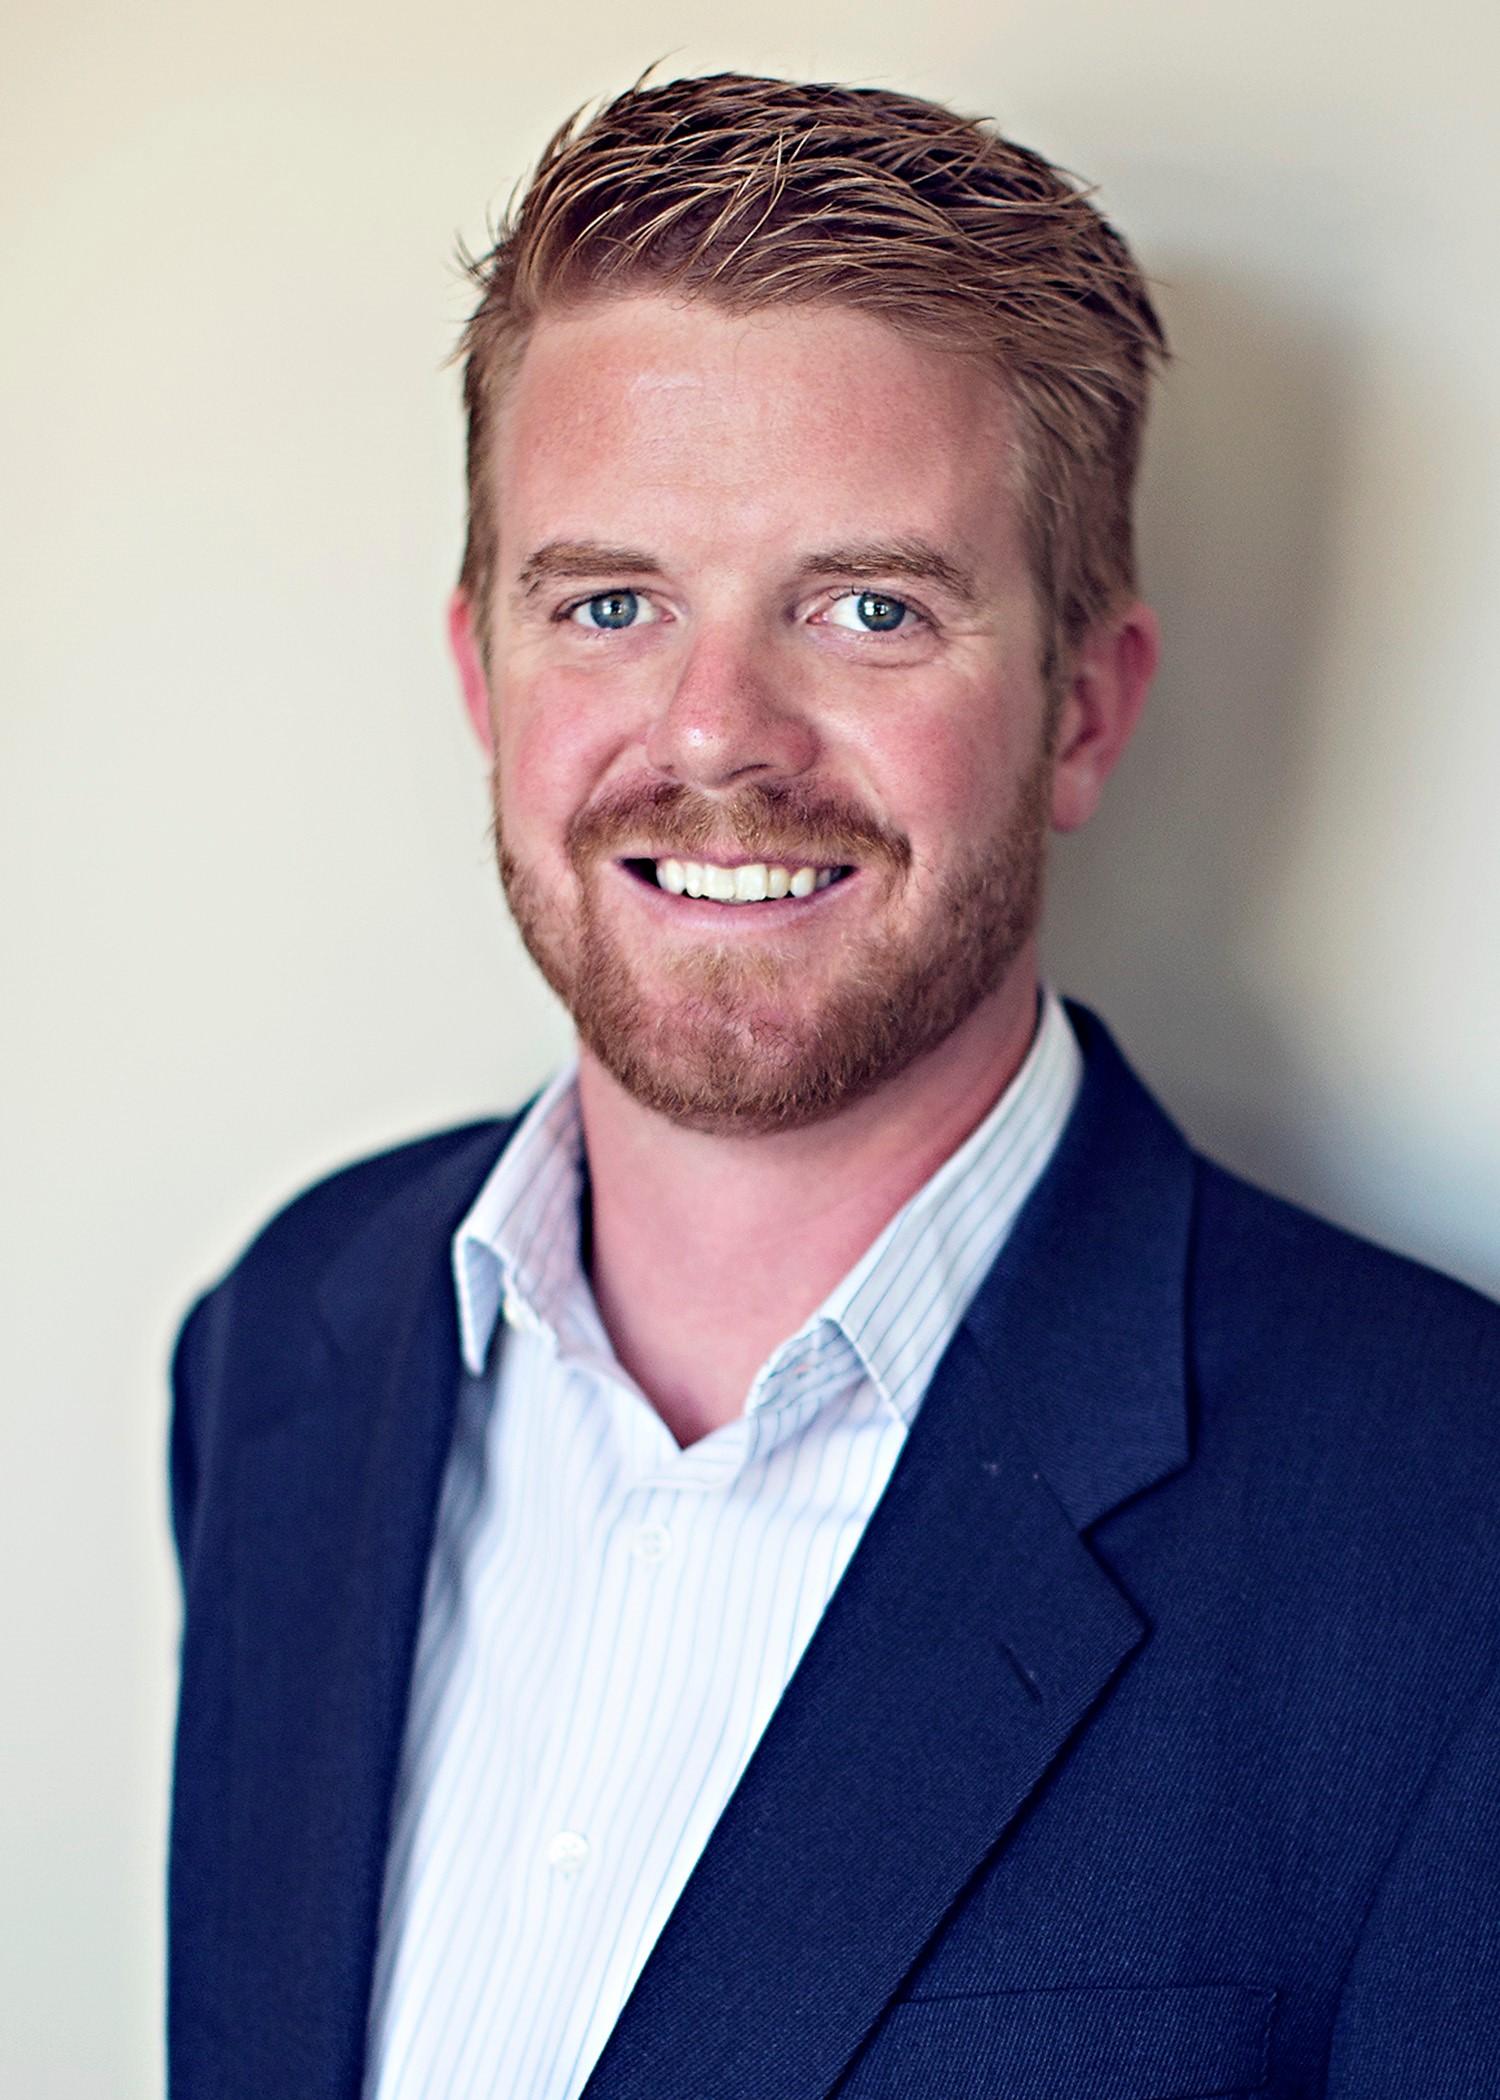 Ryan Olbrich